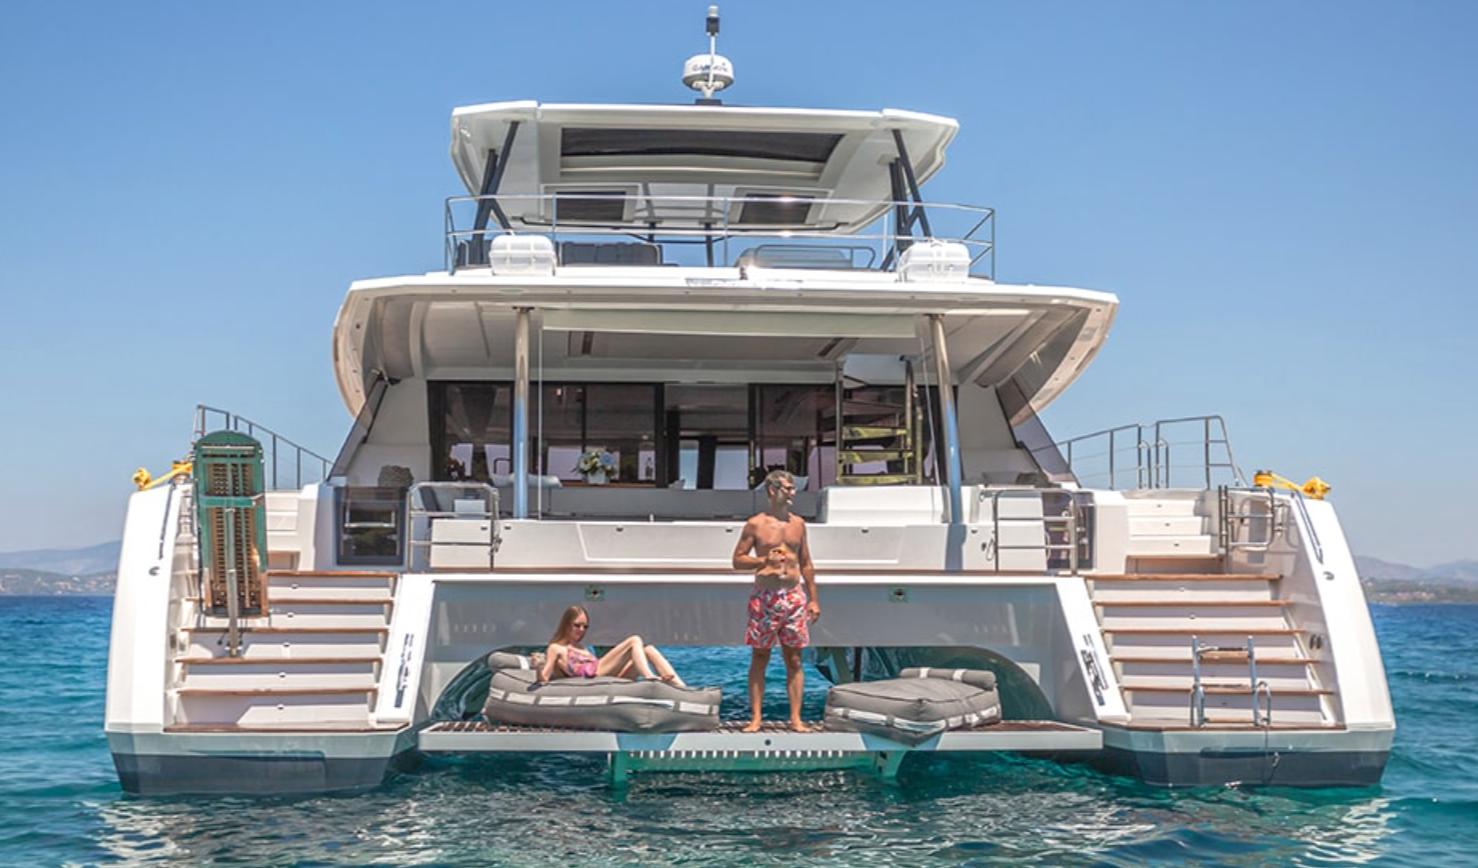 swim platform onboard the FPMY Power 67